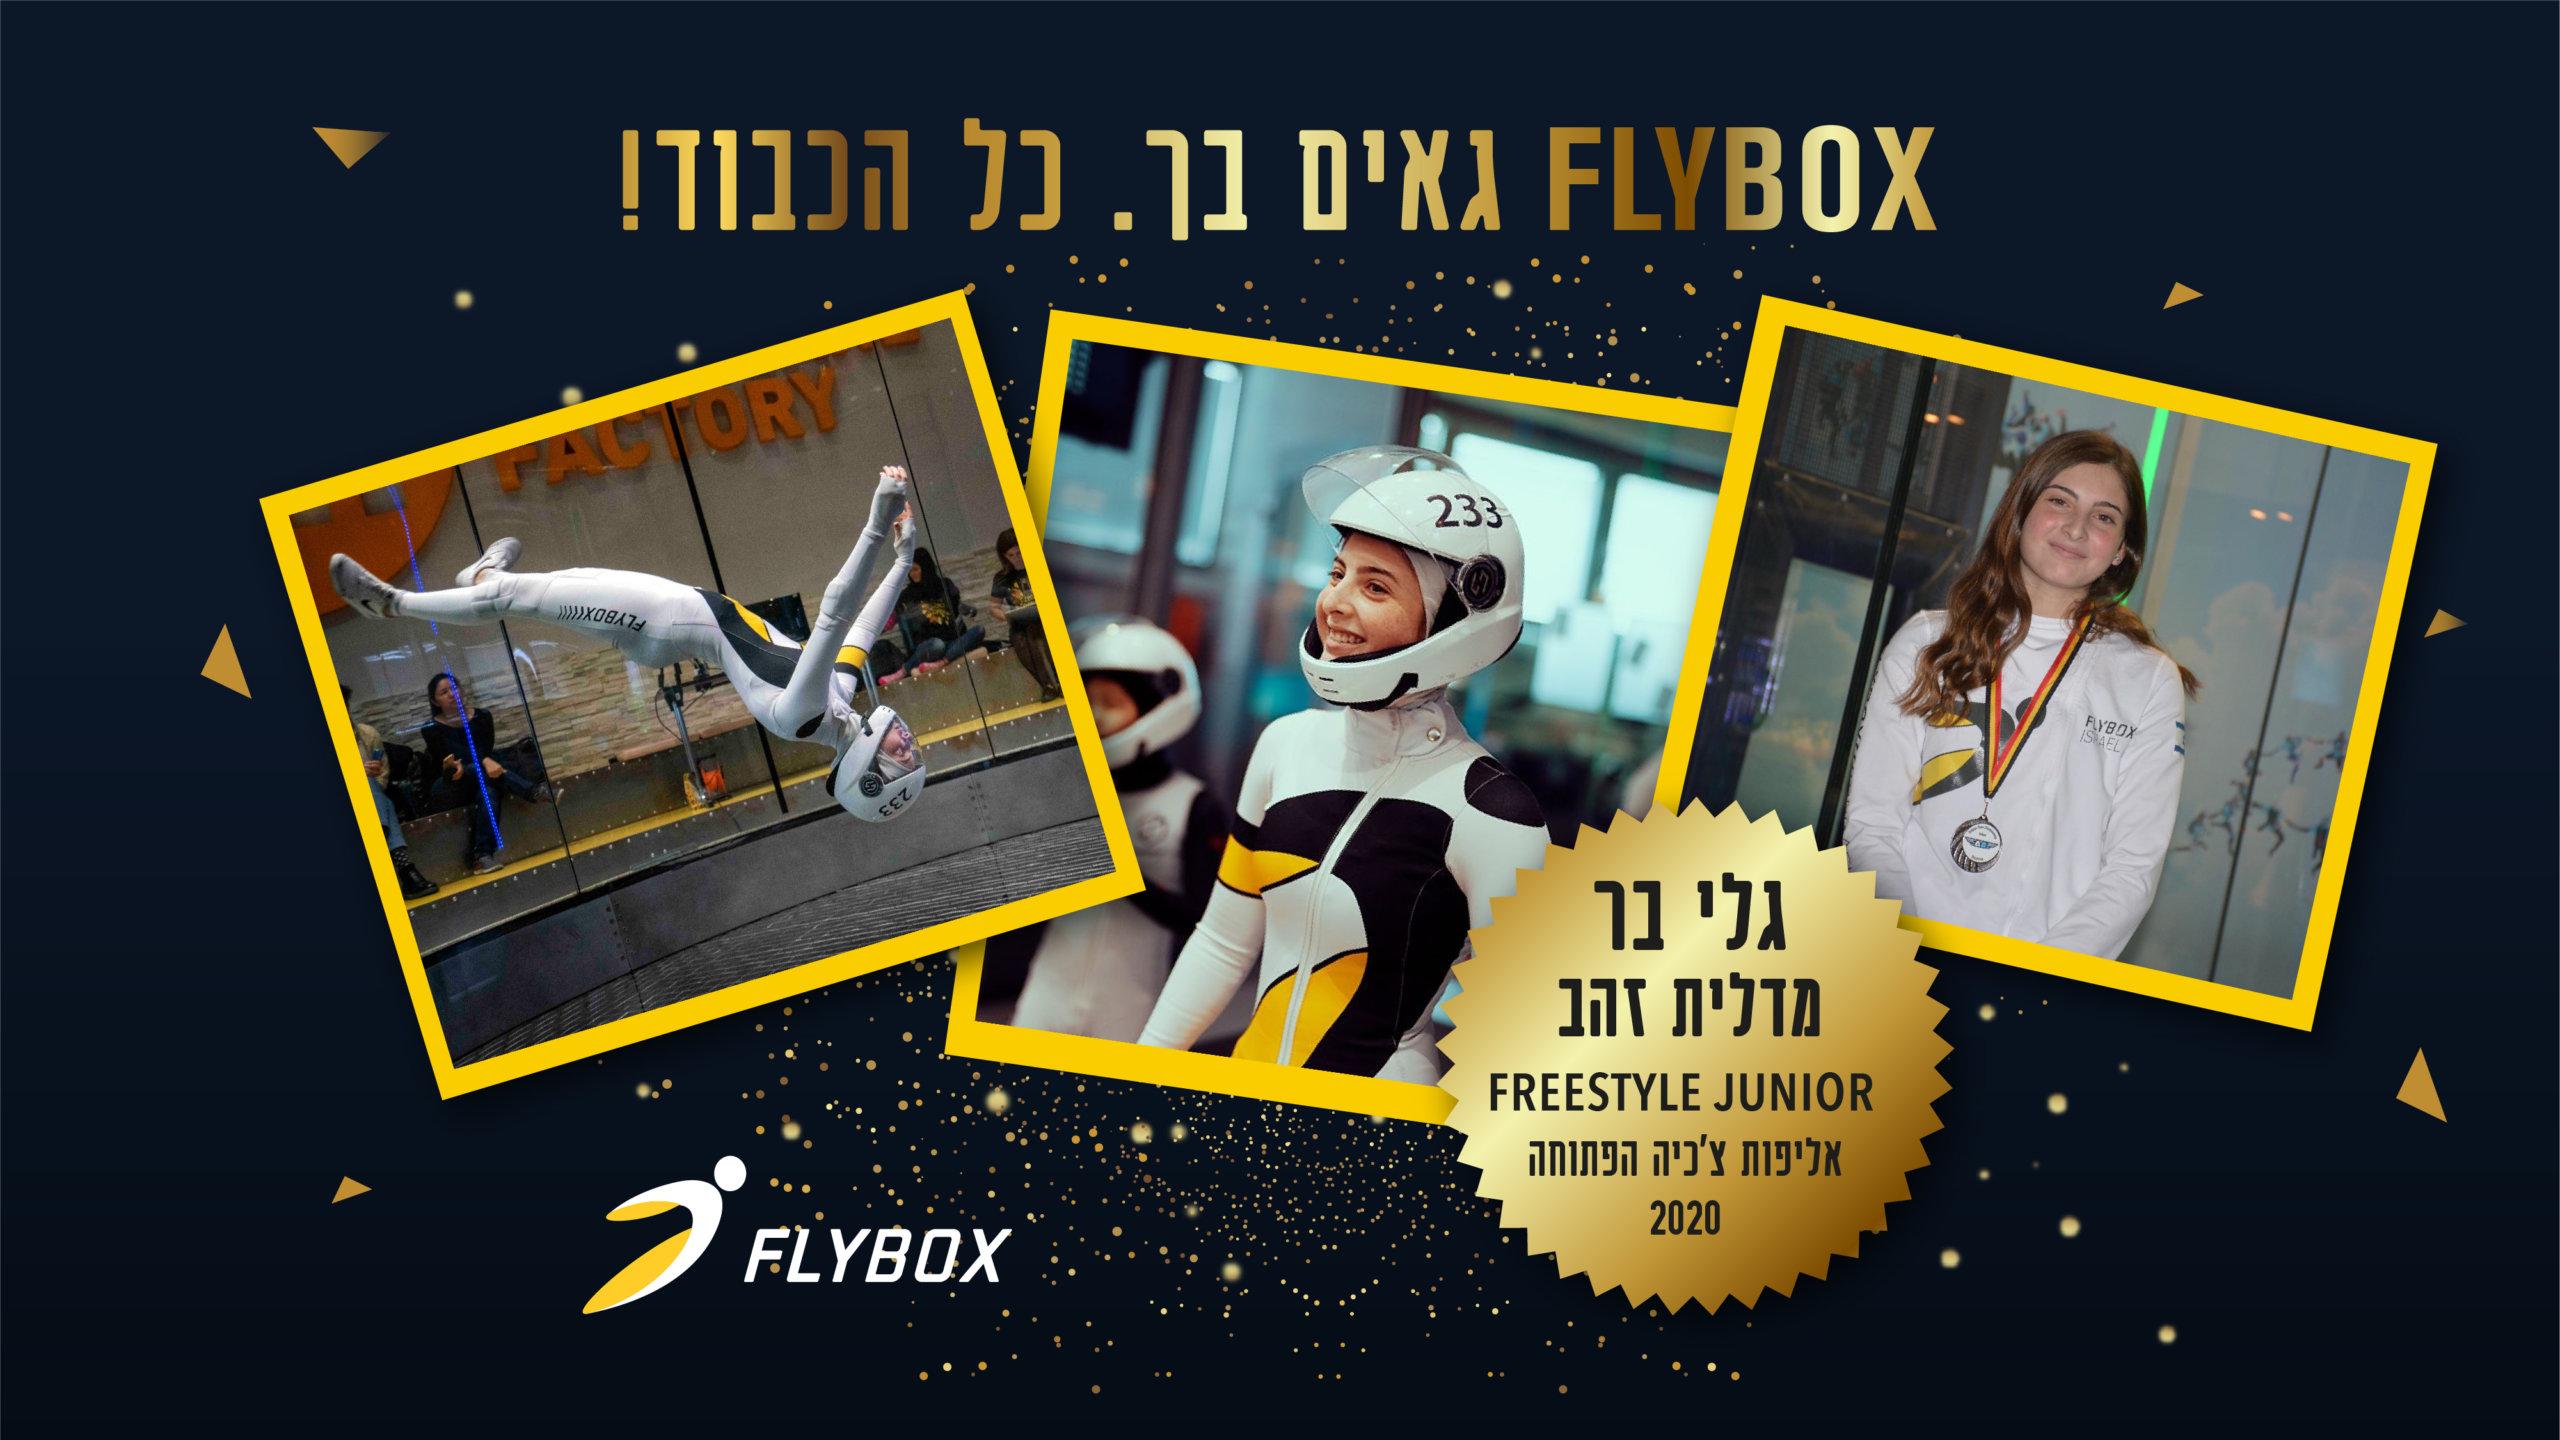 flybox_gali win_SCREEN-01